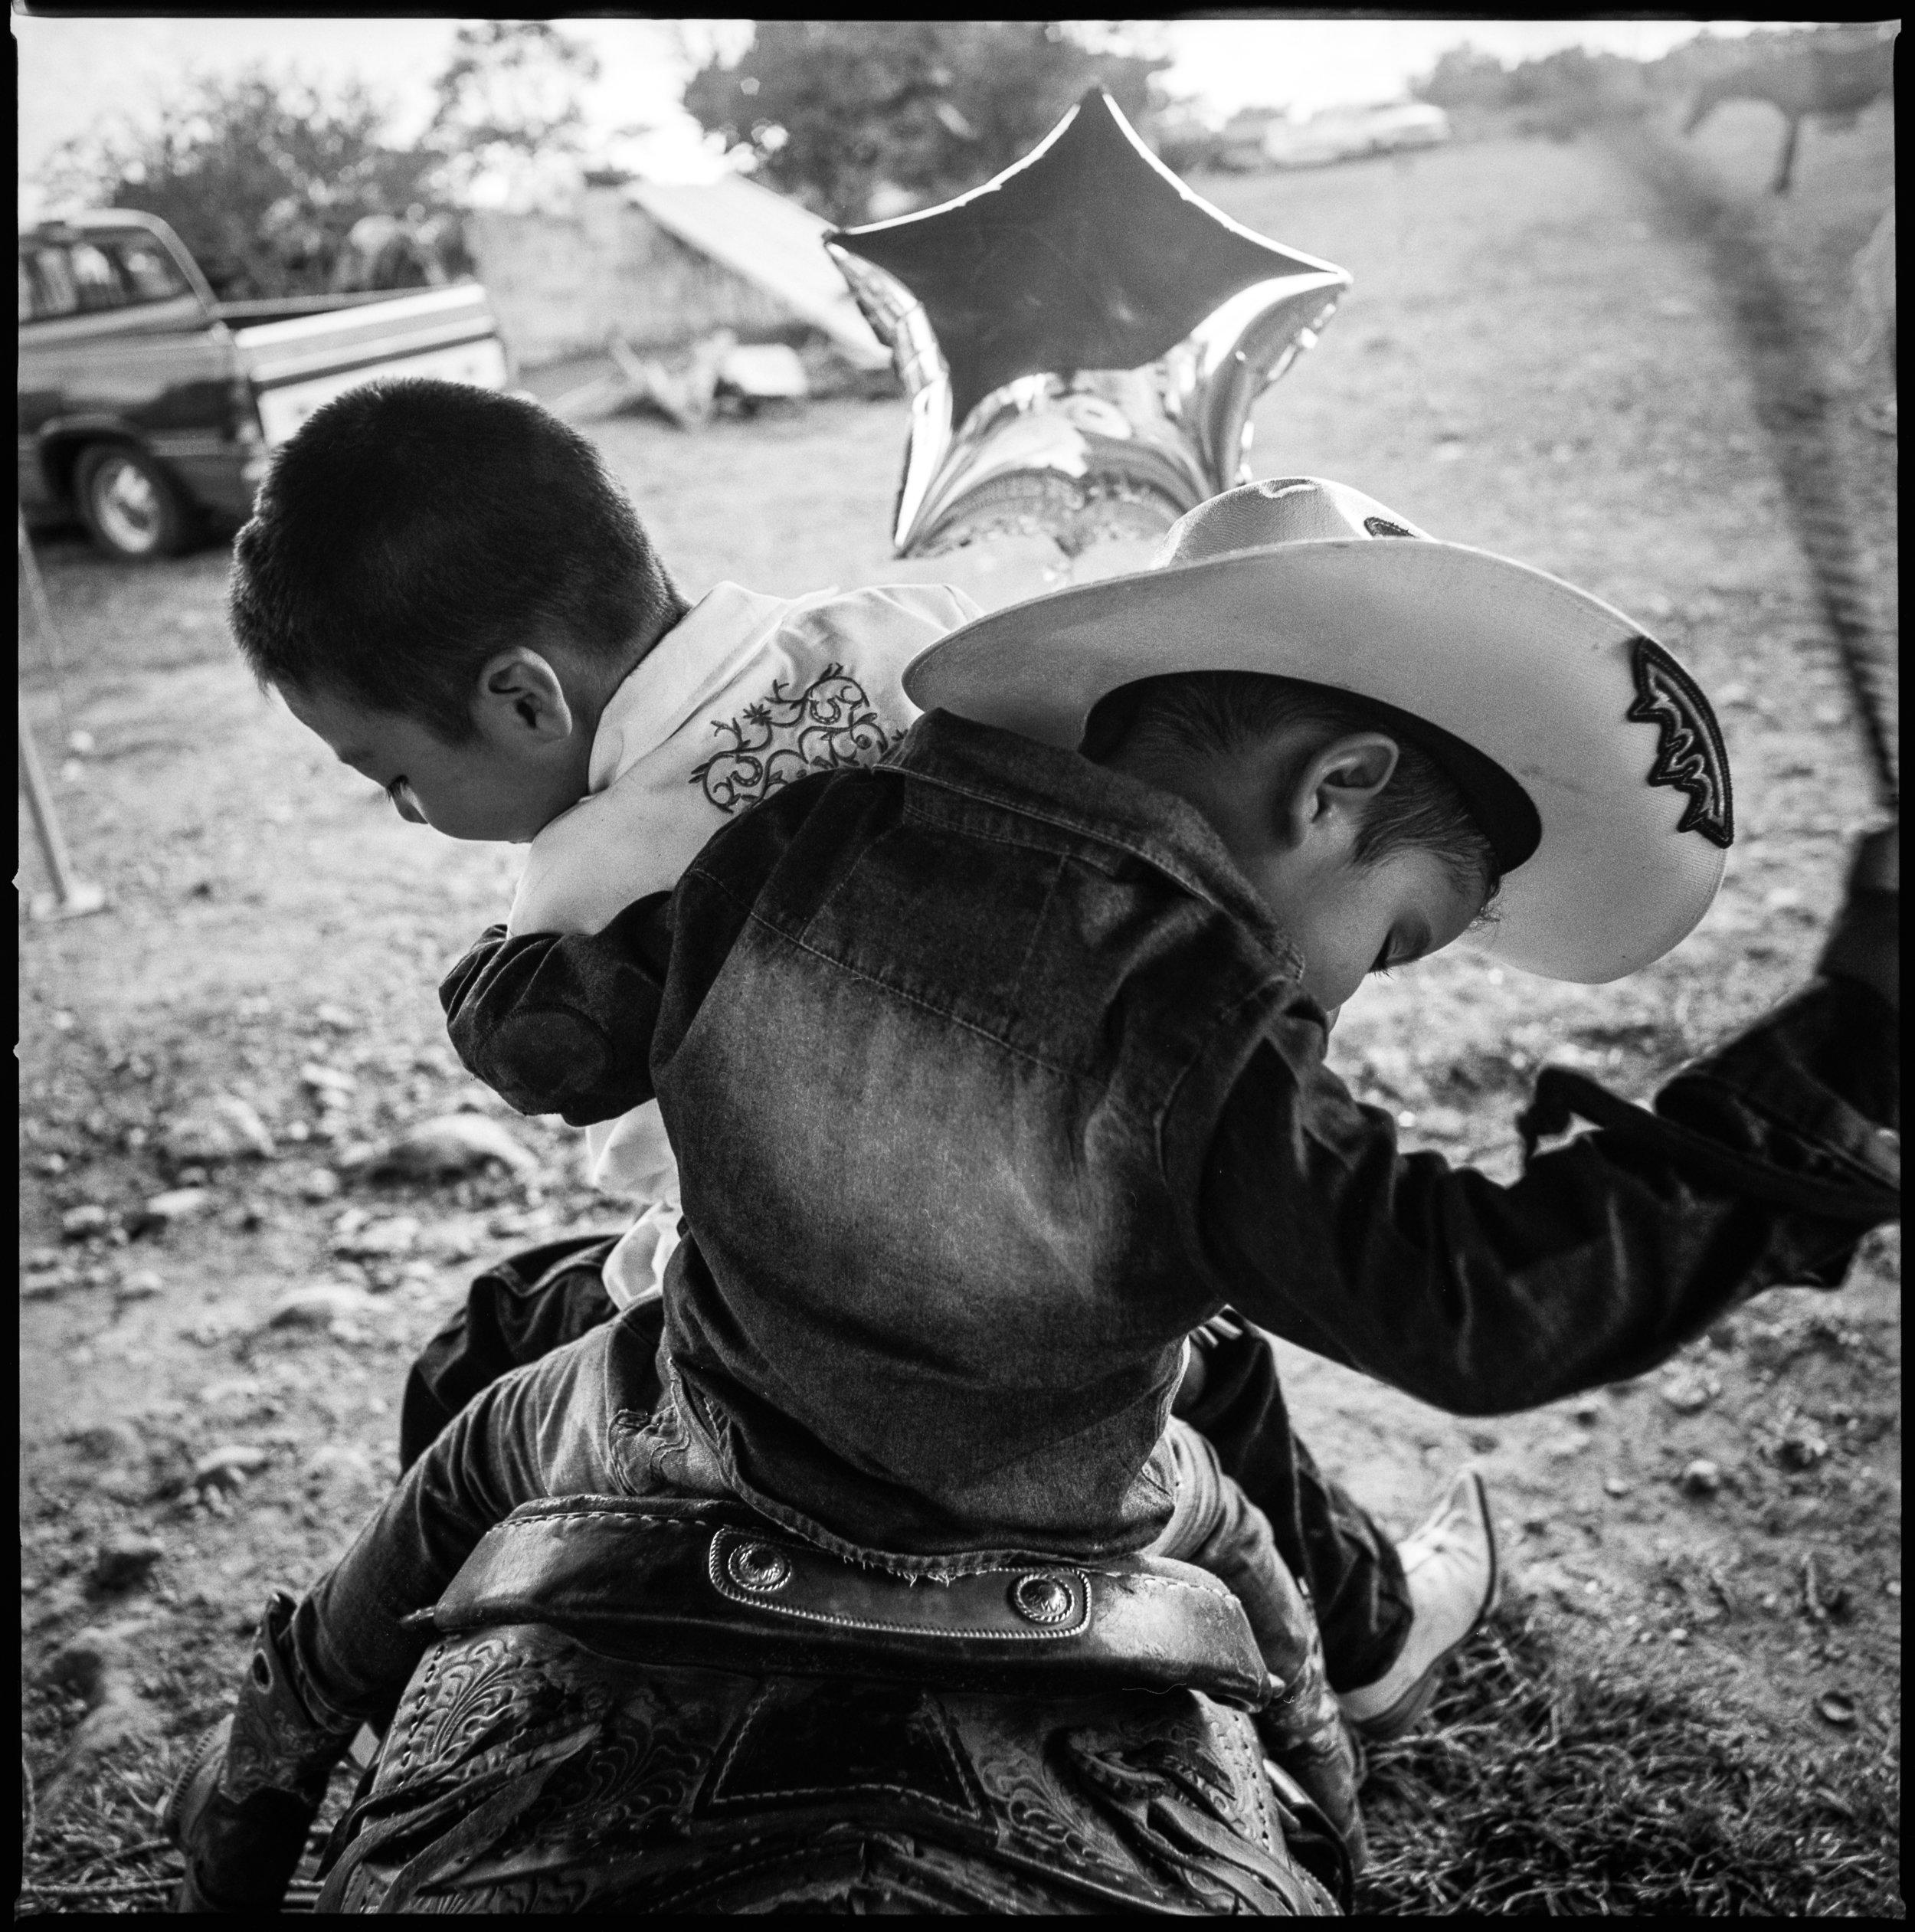 Kids practicing riding San Jose de Rodeo, Mexico, 2018